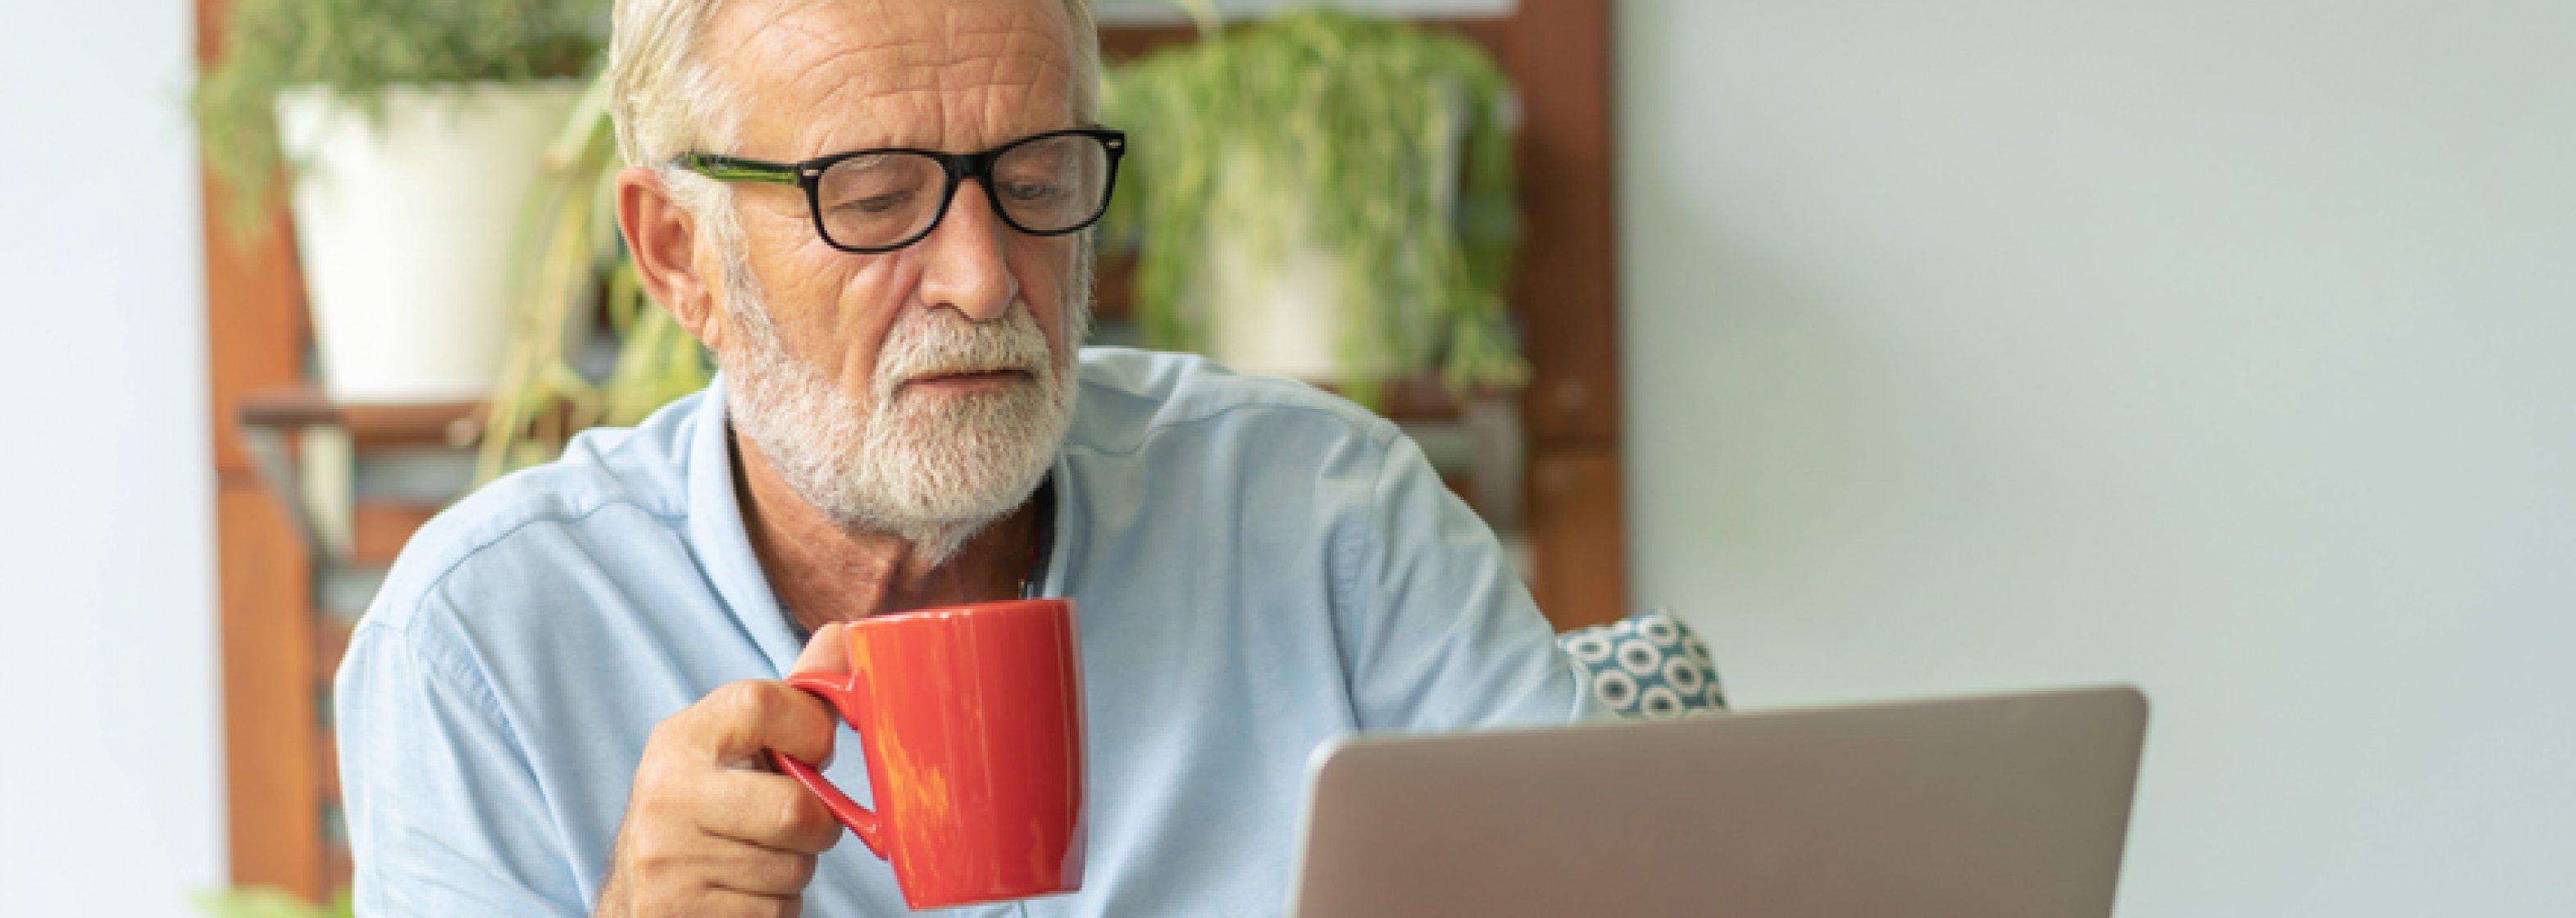 Älterer Mann arbeitet am Laptop